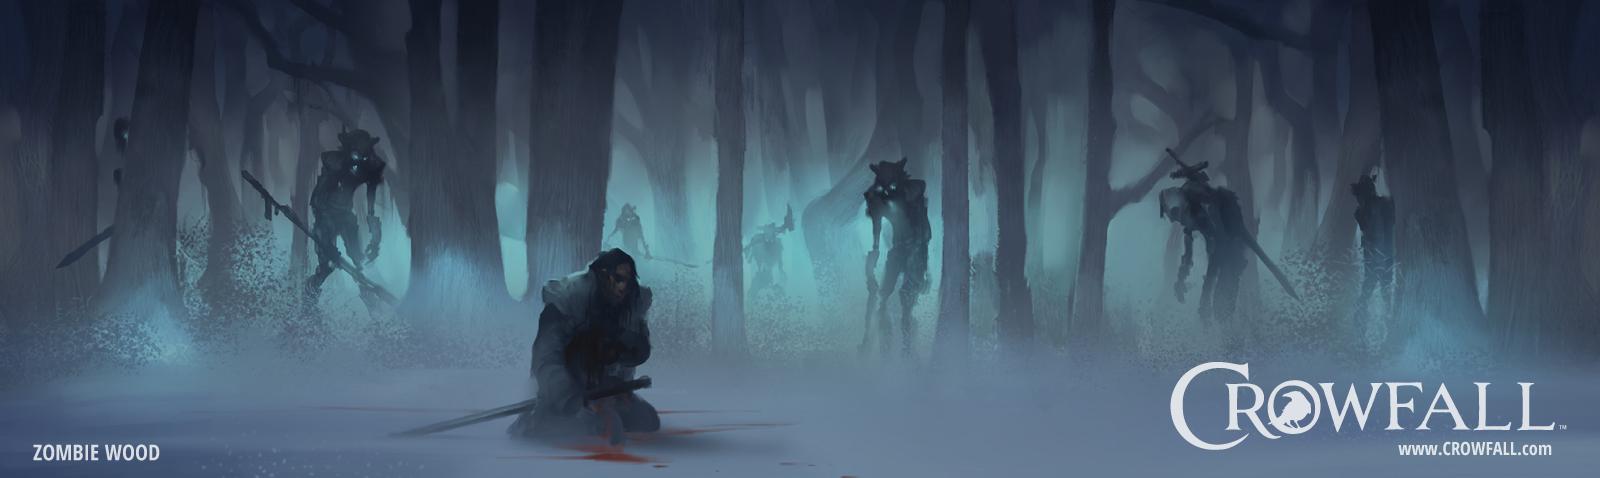 2814659-crowfall_zombiewoodconcept